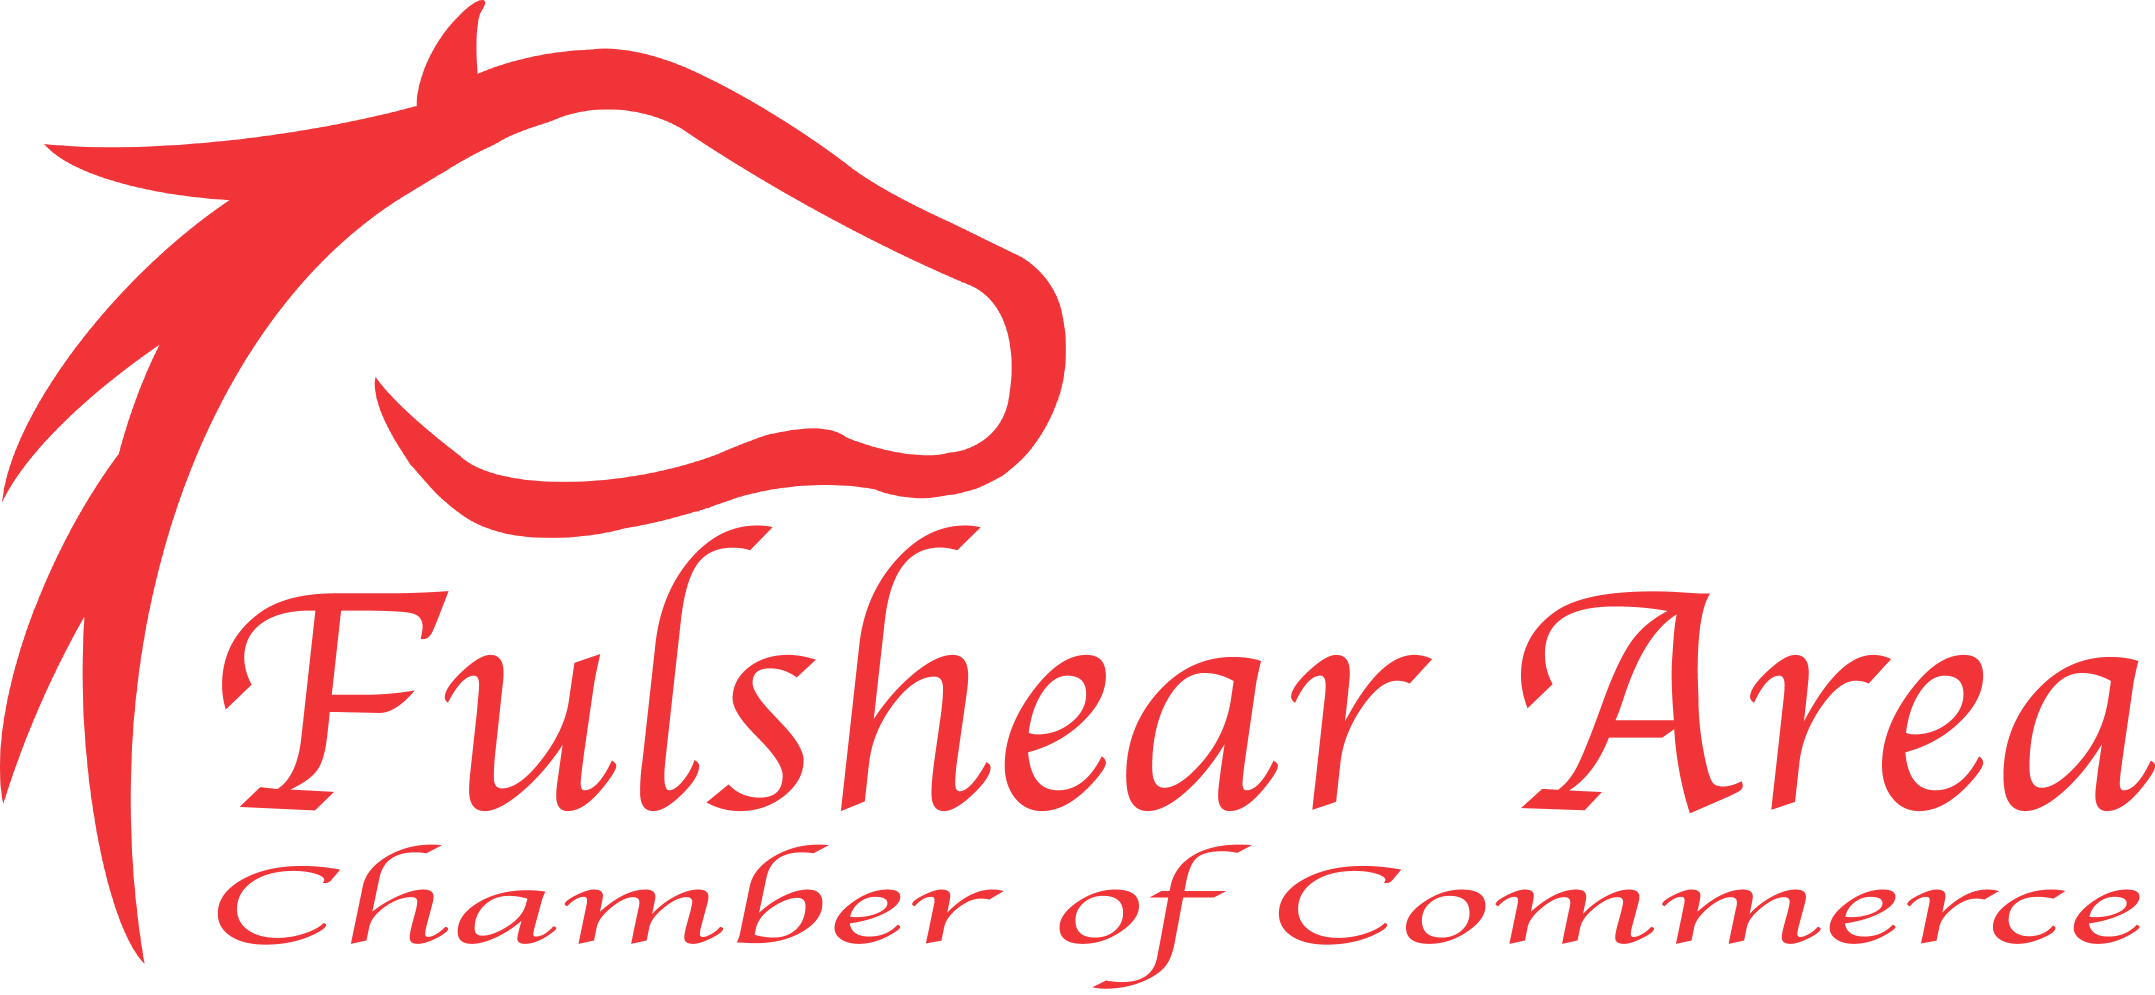 Fulshear Area Chamber of Commerce Logo